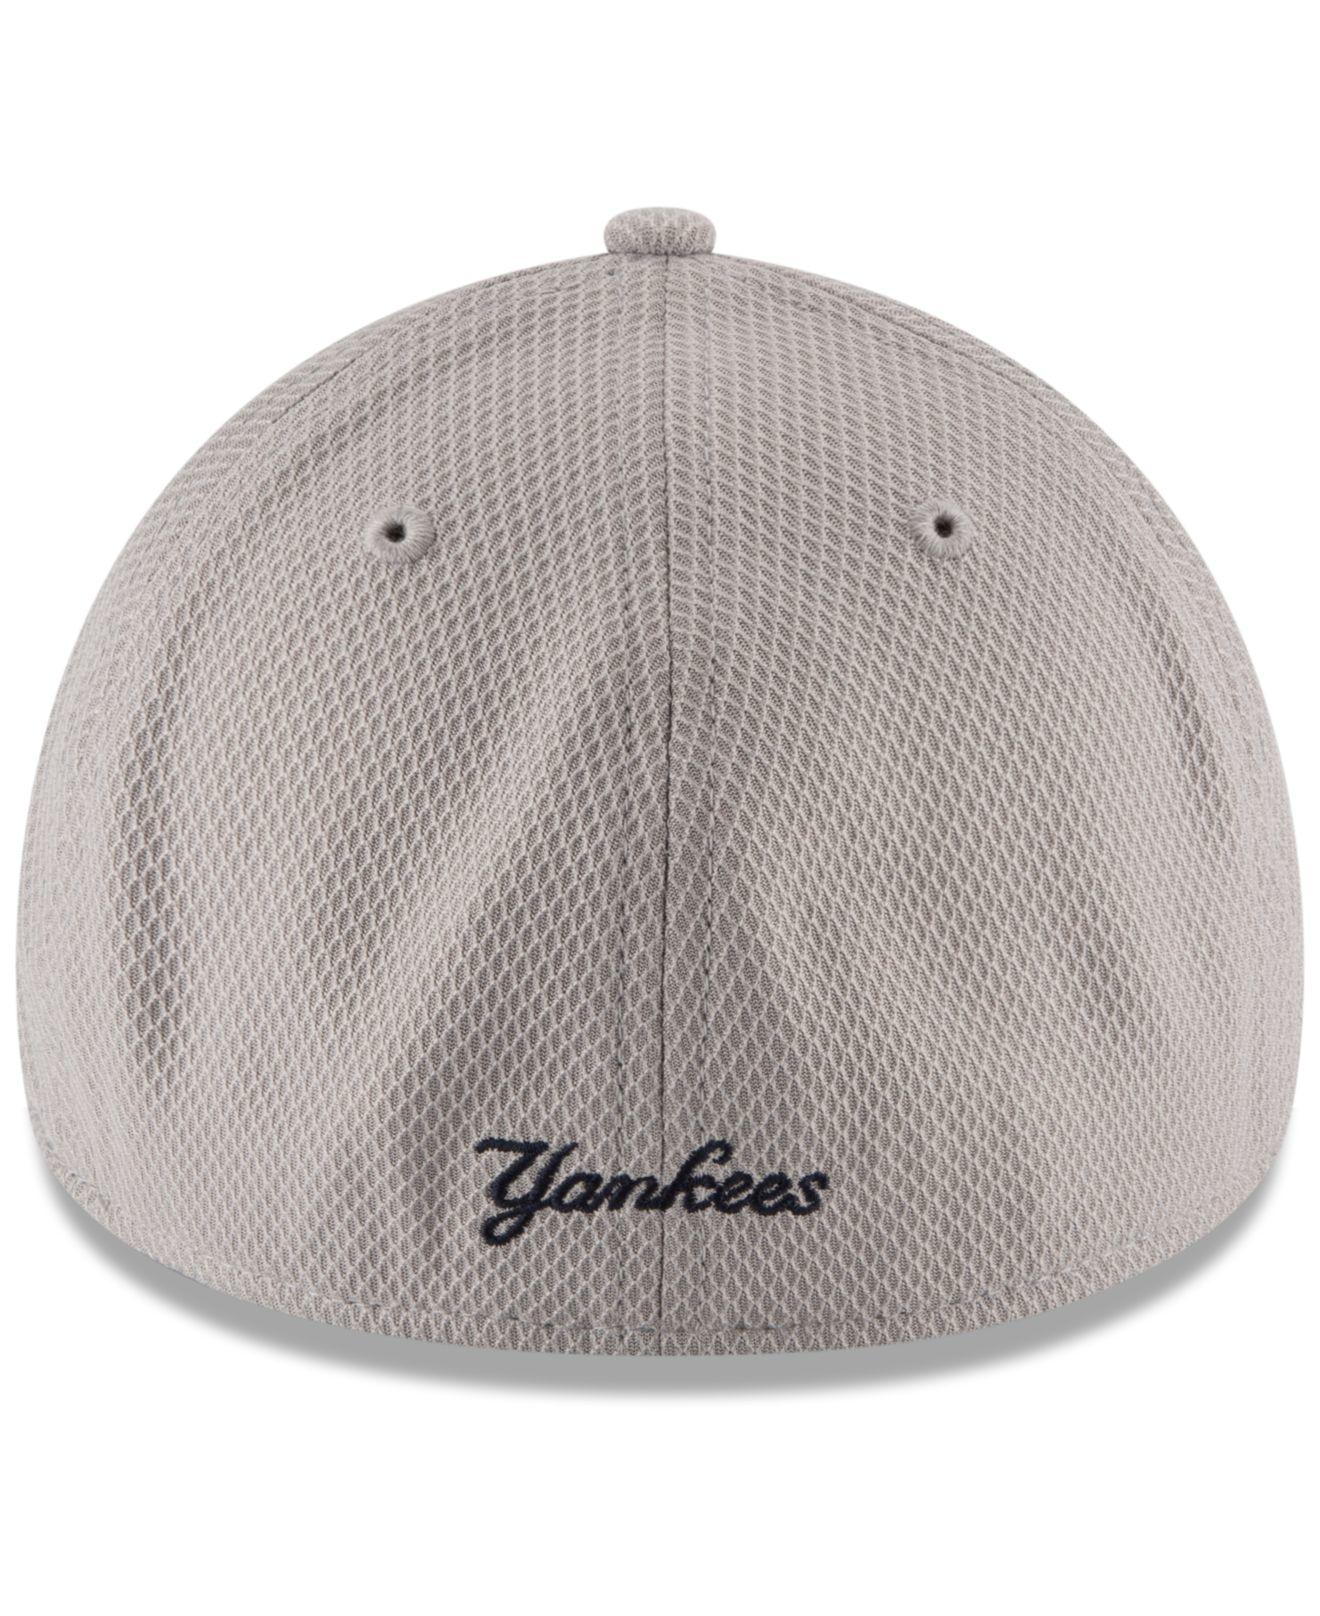 online store a78de 181b5 ... era royal mlb team classic 39thirty flex hat 6ee52 52767  get lyst ktz  new york yankees team grayed 39thirty cap in gray for men 55238 3bcbf